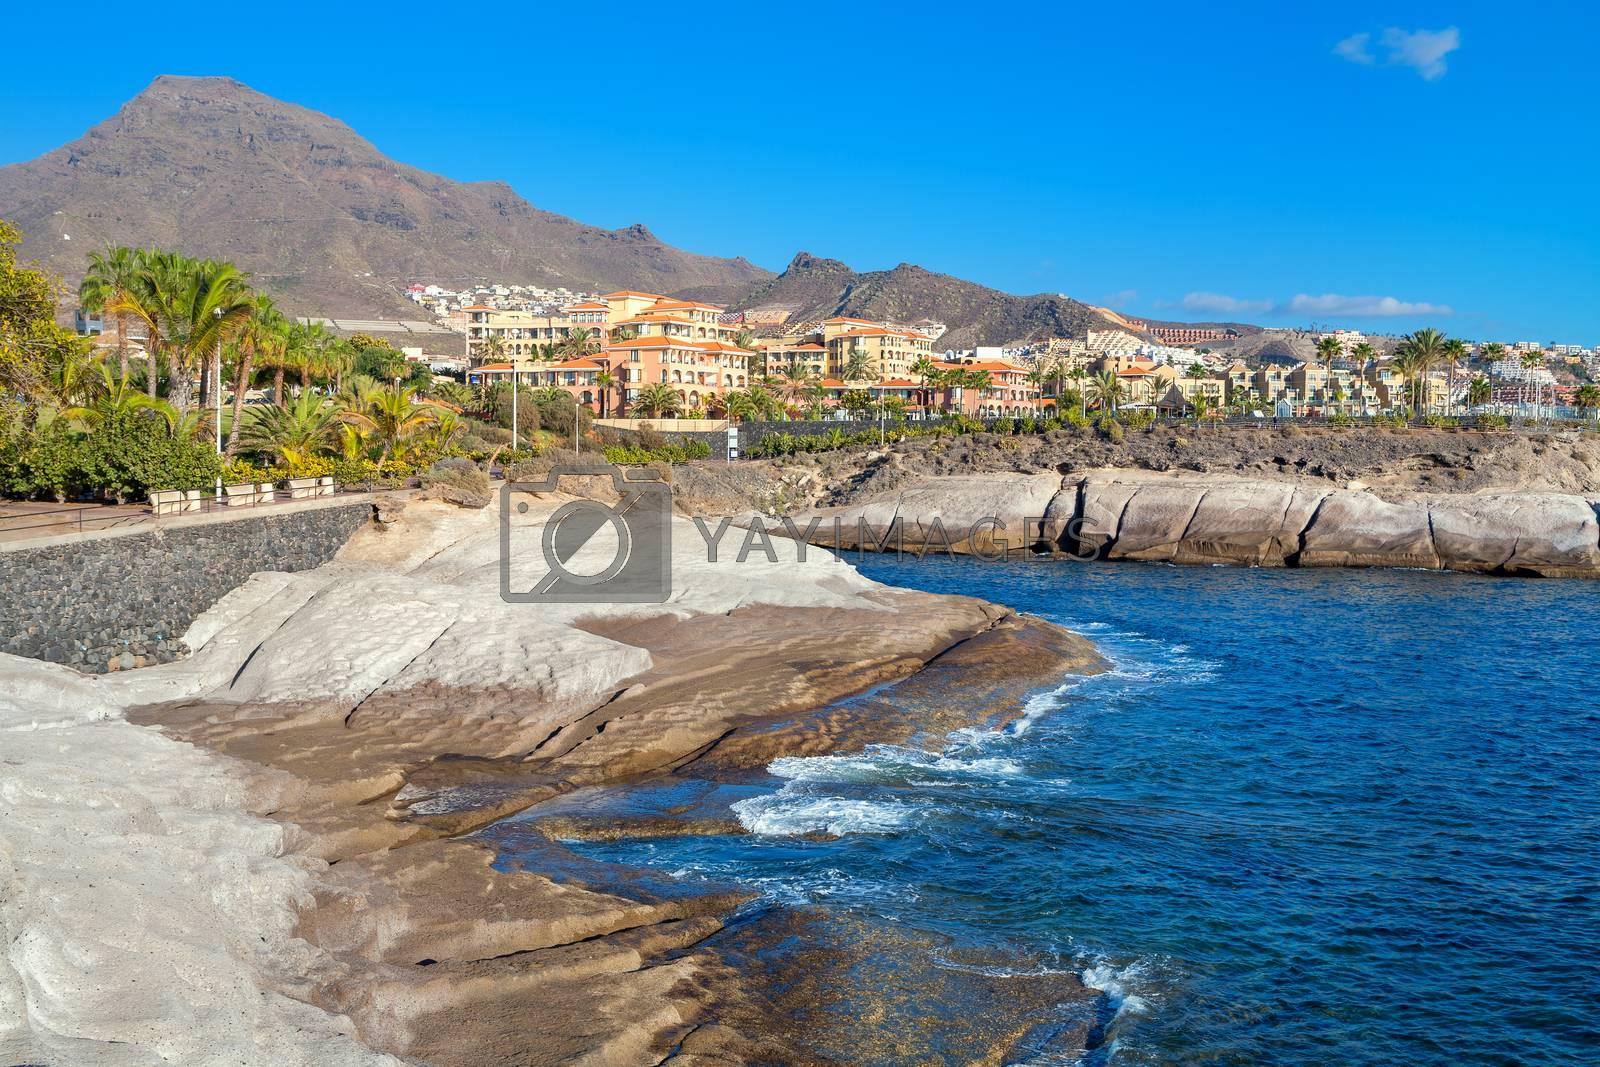 Rocky coastline of Costa Adeje. Tenerife. Canary Islands. Spain